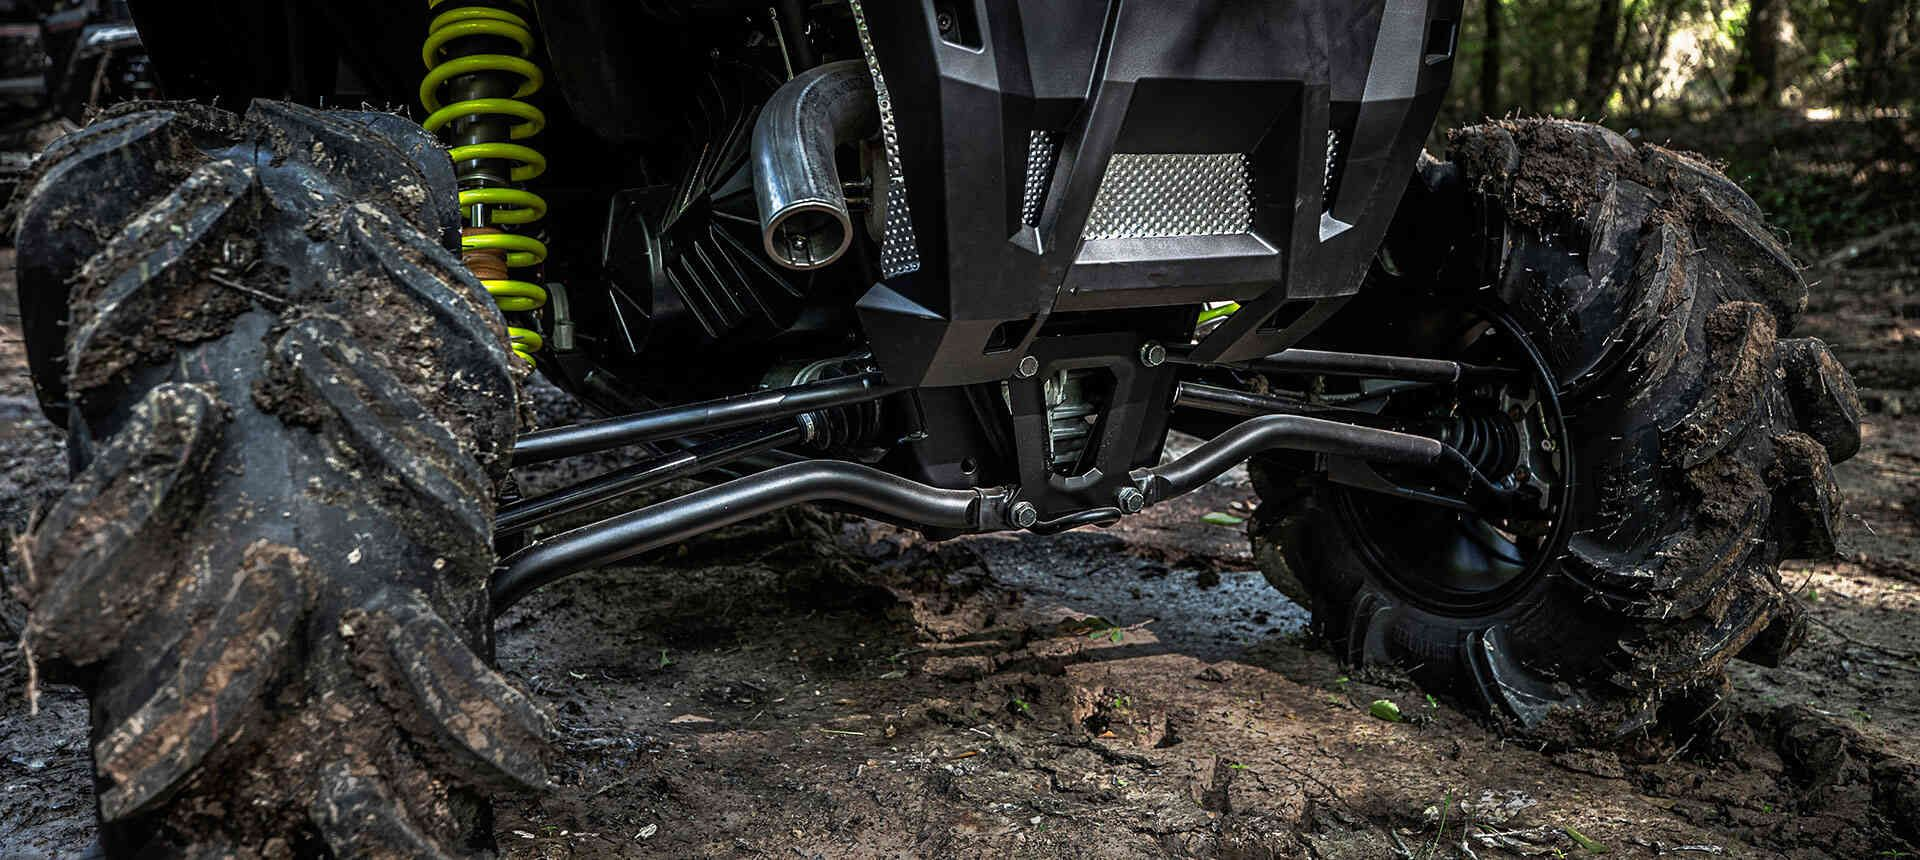 Мотовездеход Polaris RZR XP® 4 1000 High Lifter Stealth Gray 2020 - 14